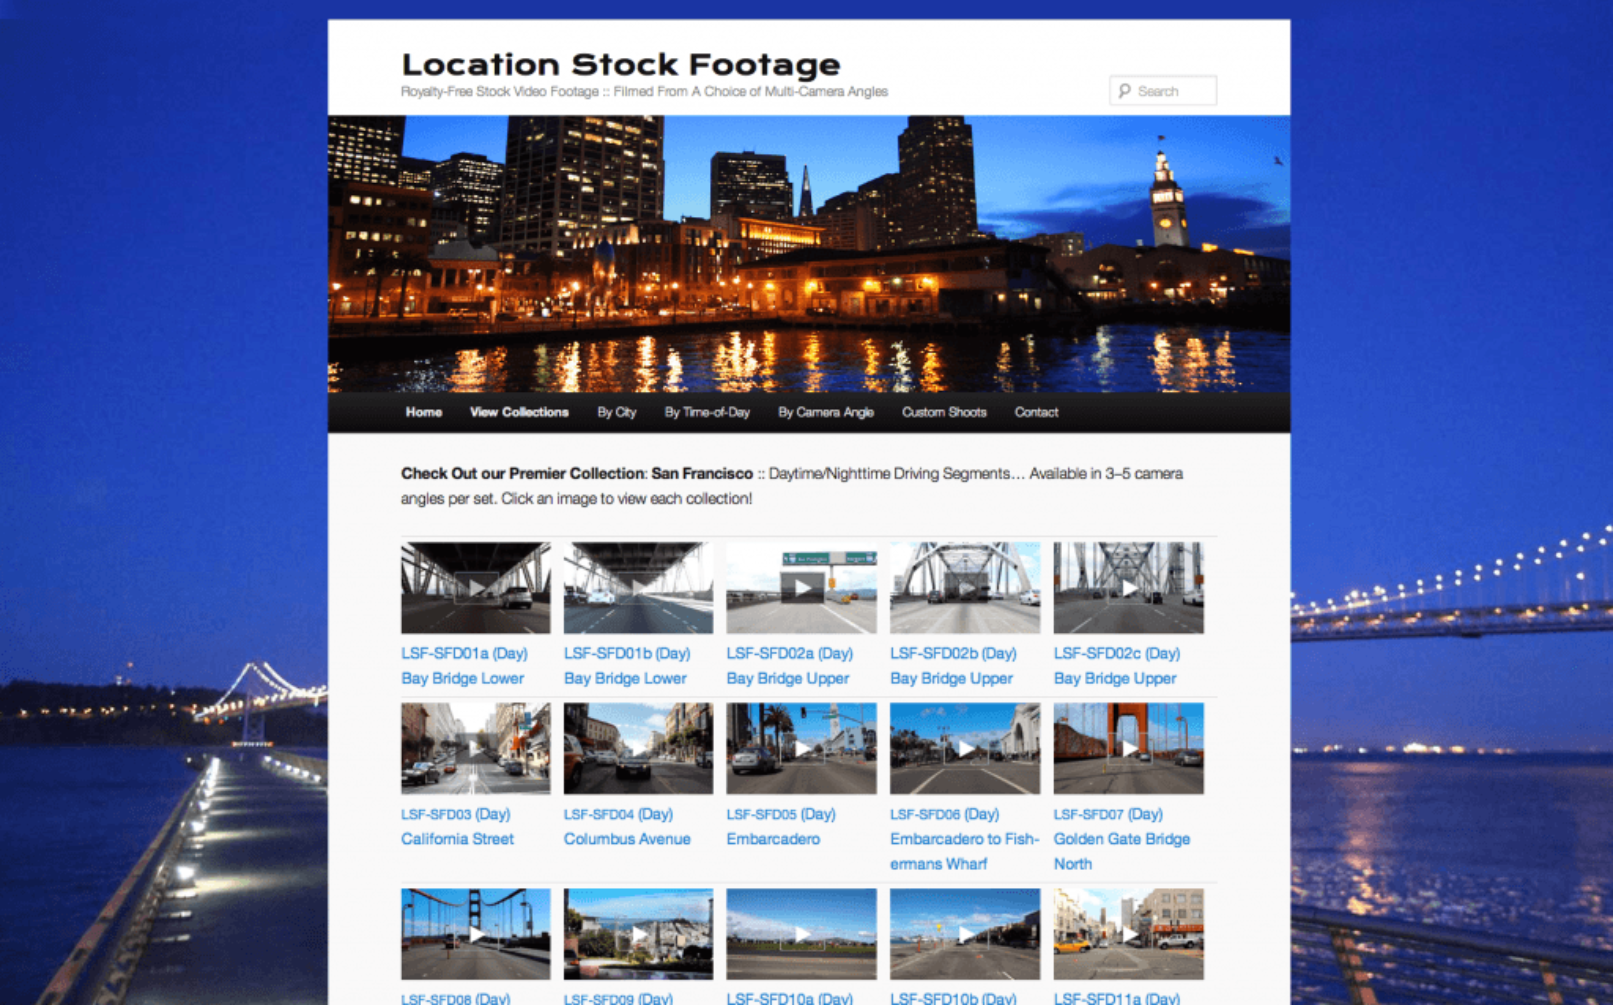 Location Stock Footage.com